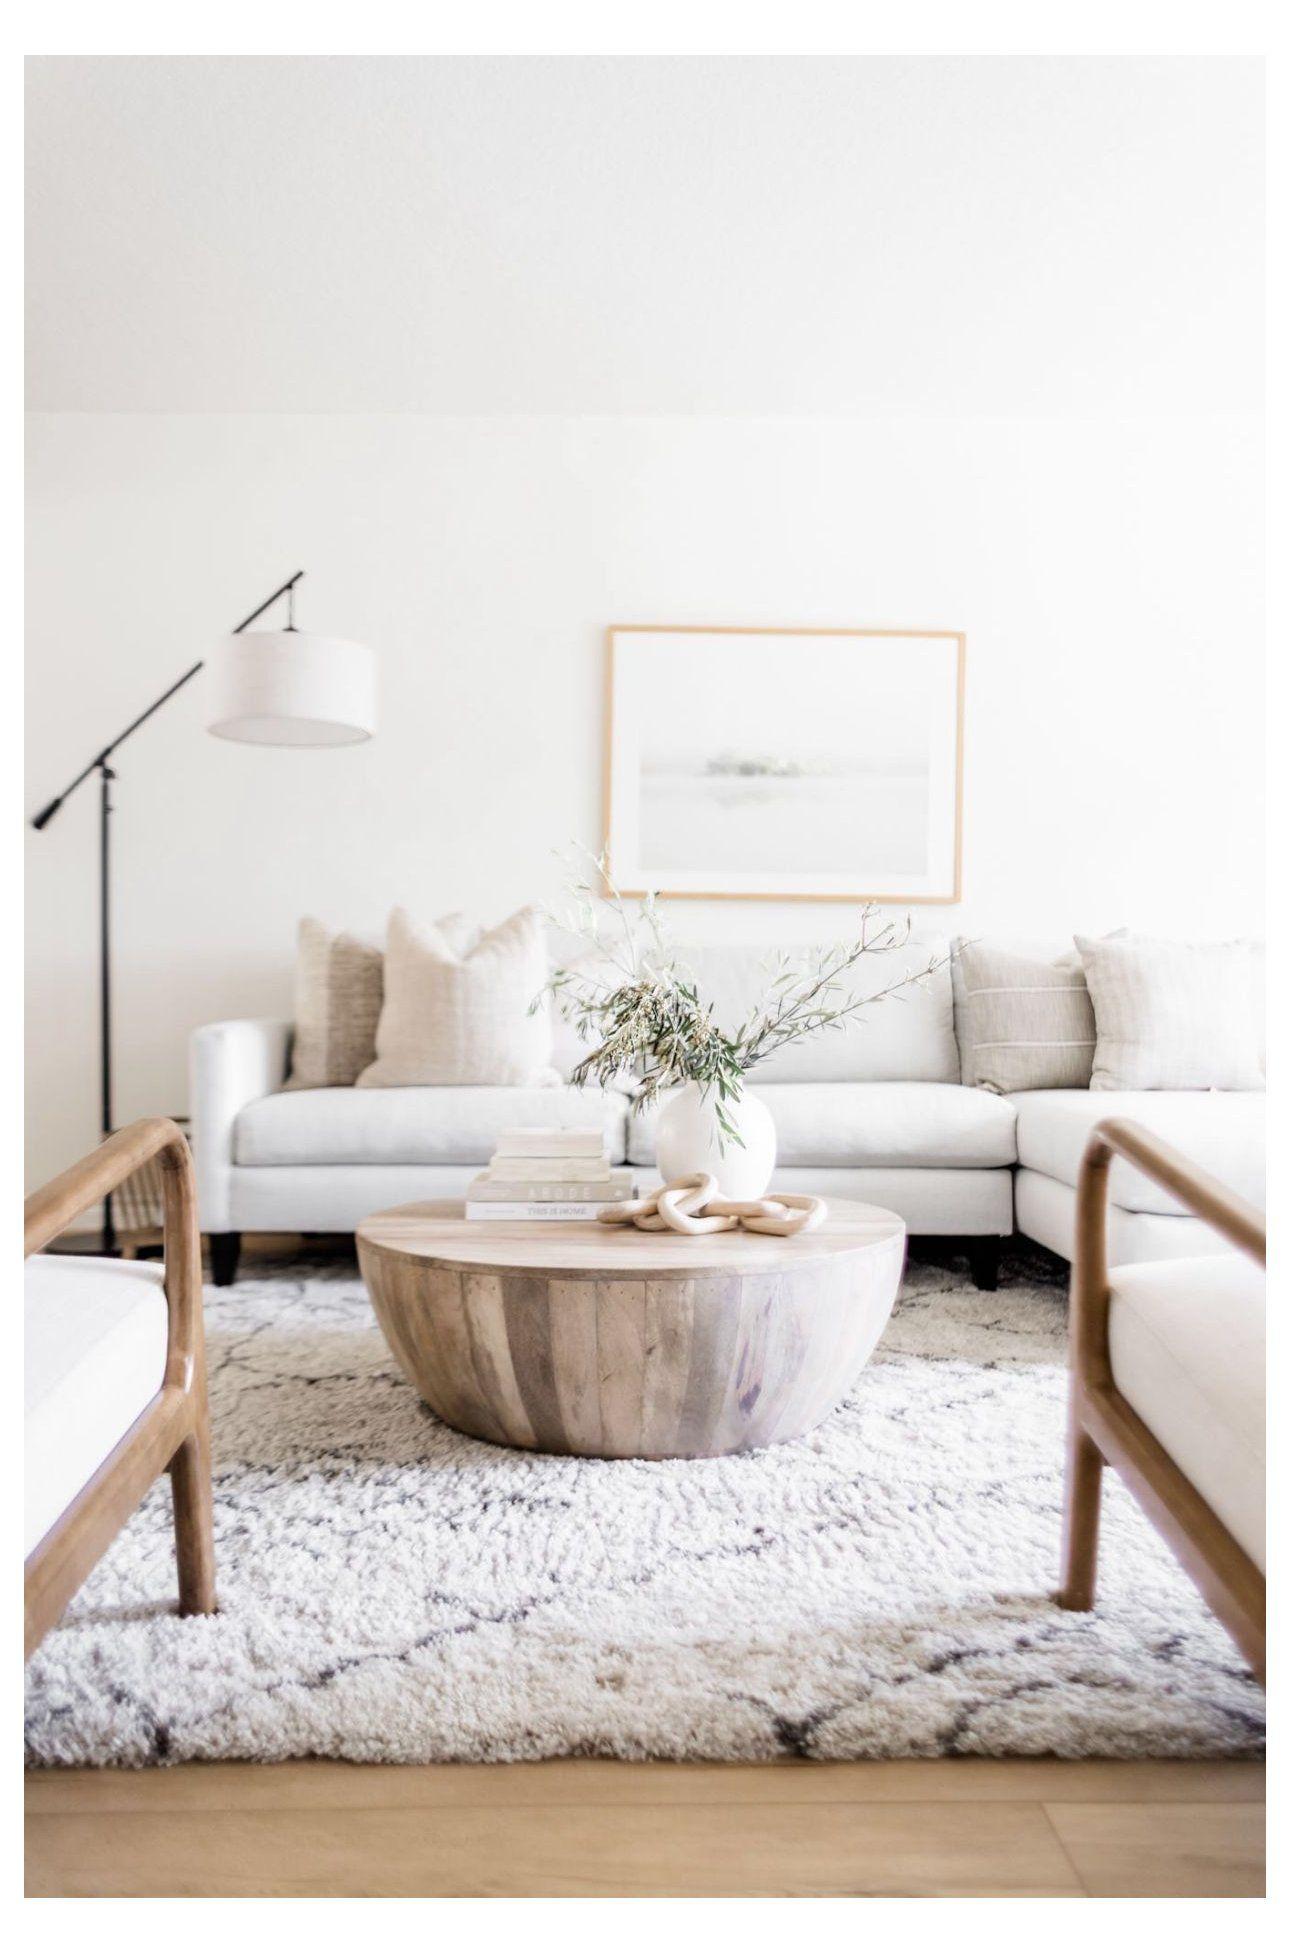 Last Week S Follower Favorites Living Room Area Rug Ideas Farmhouse Happy Sunday In 2020 Rugs In Living Room Minimalist Living Room Home Decor #small #living #room #rug #ideas